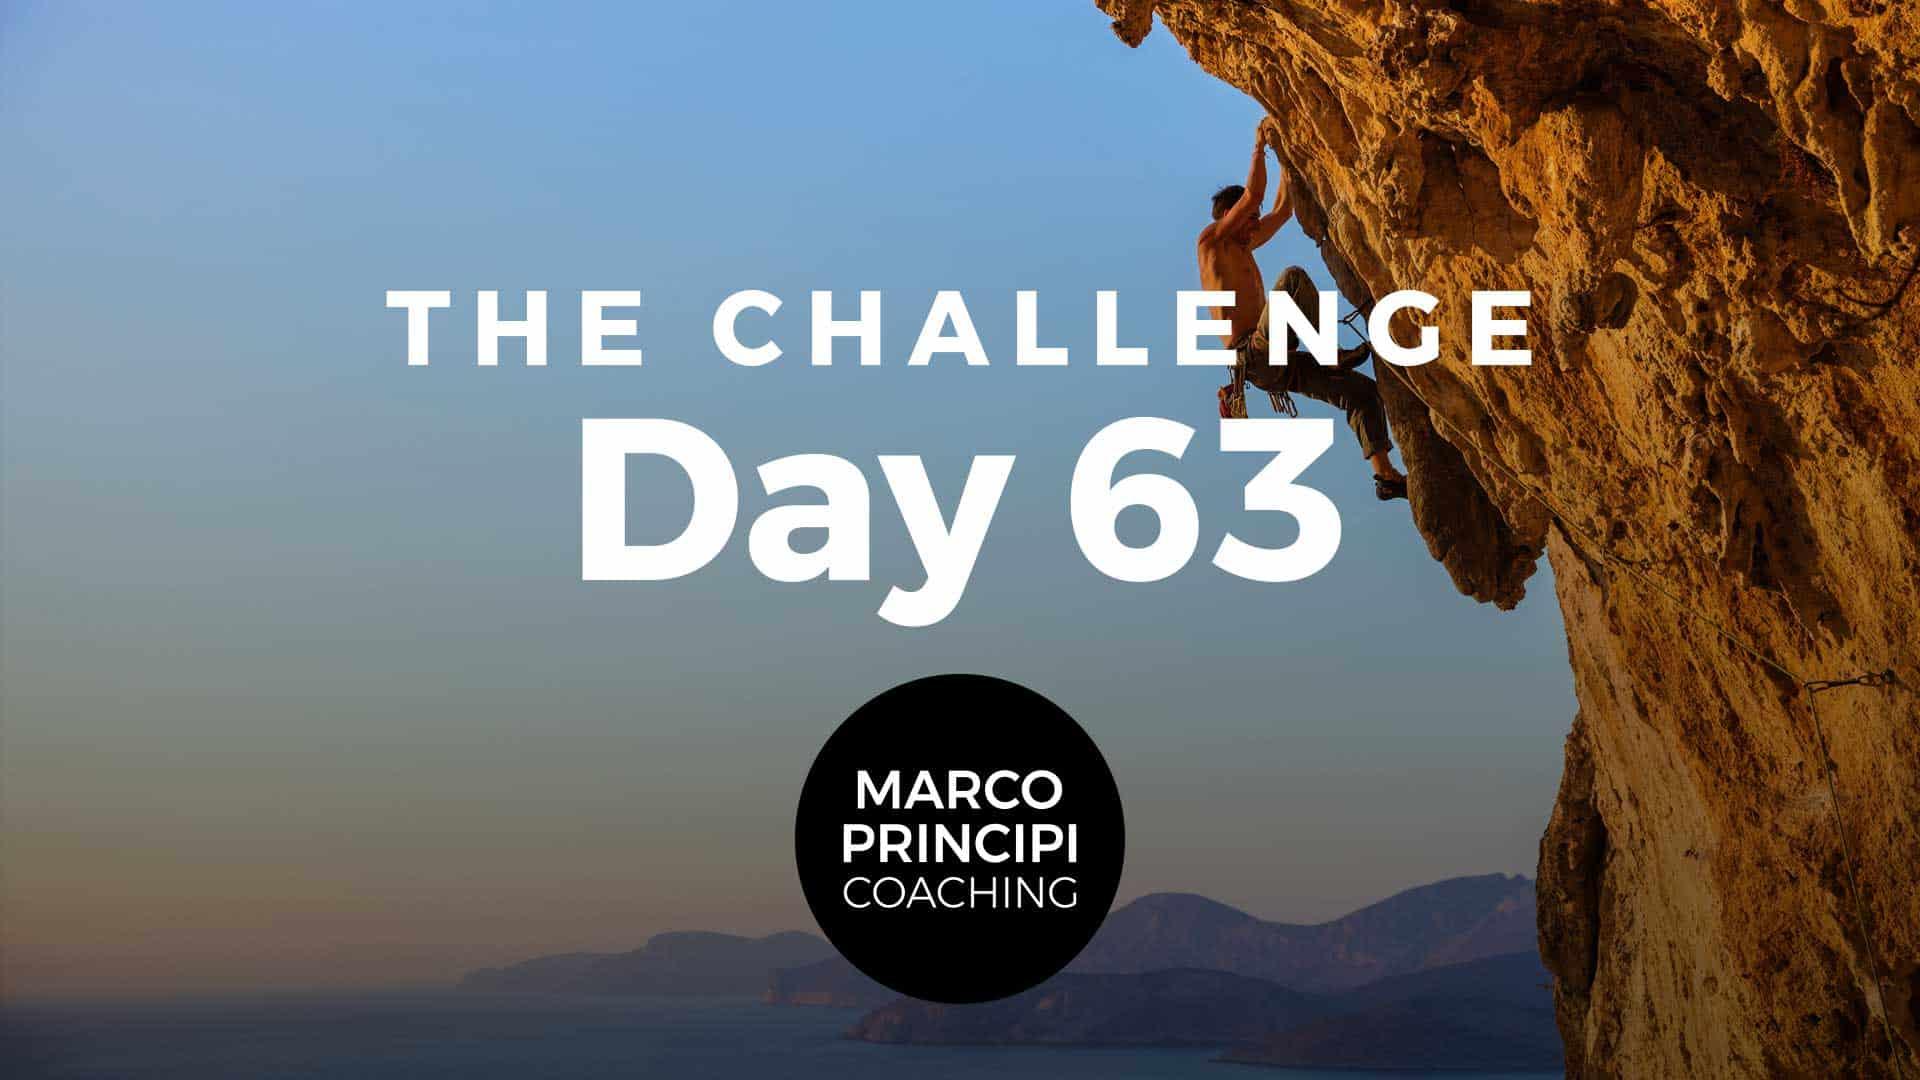 Marco Principi The Challenge Day 63